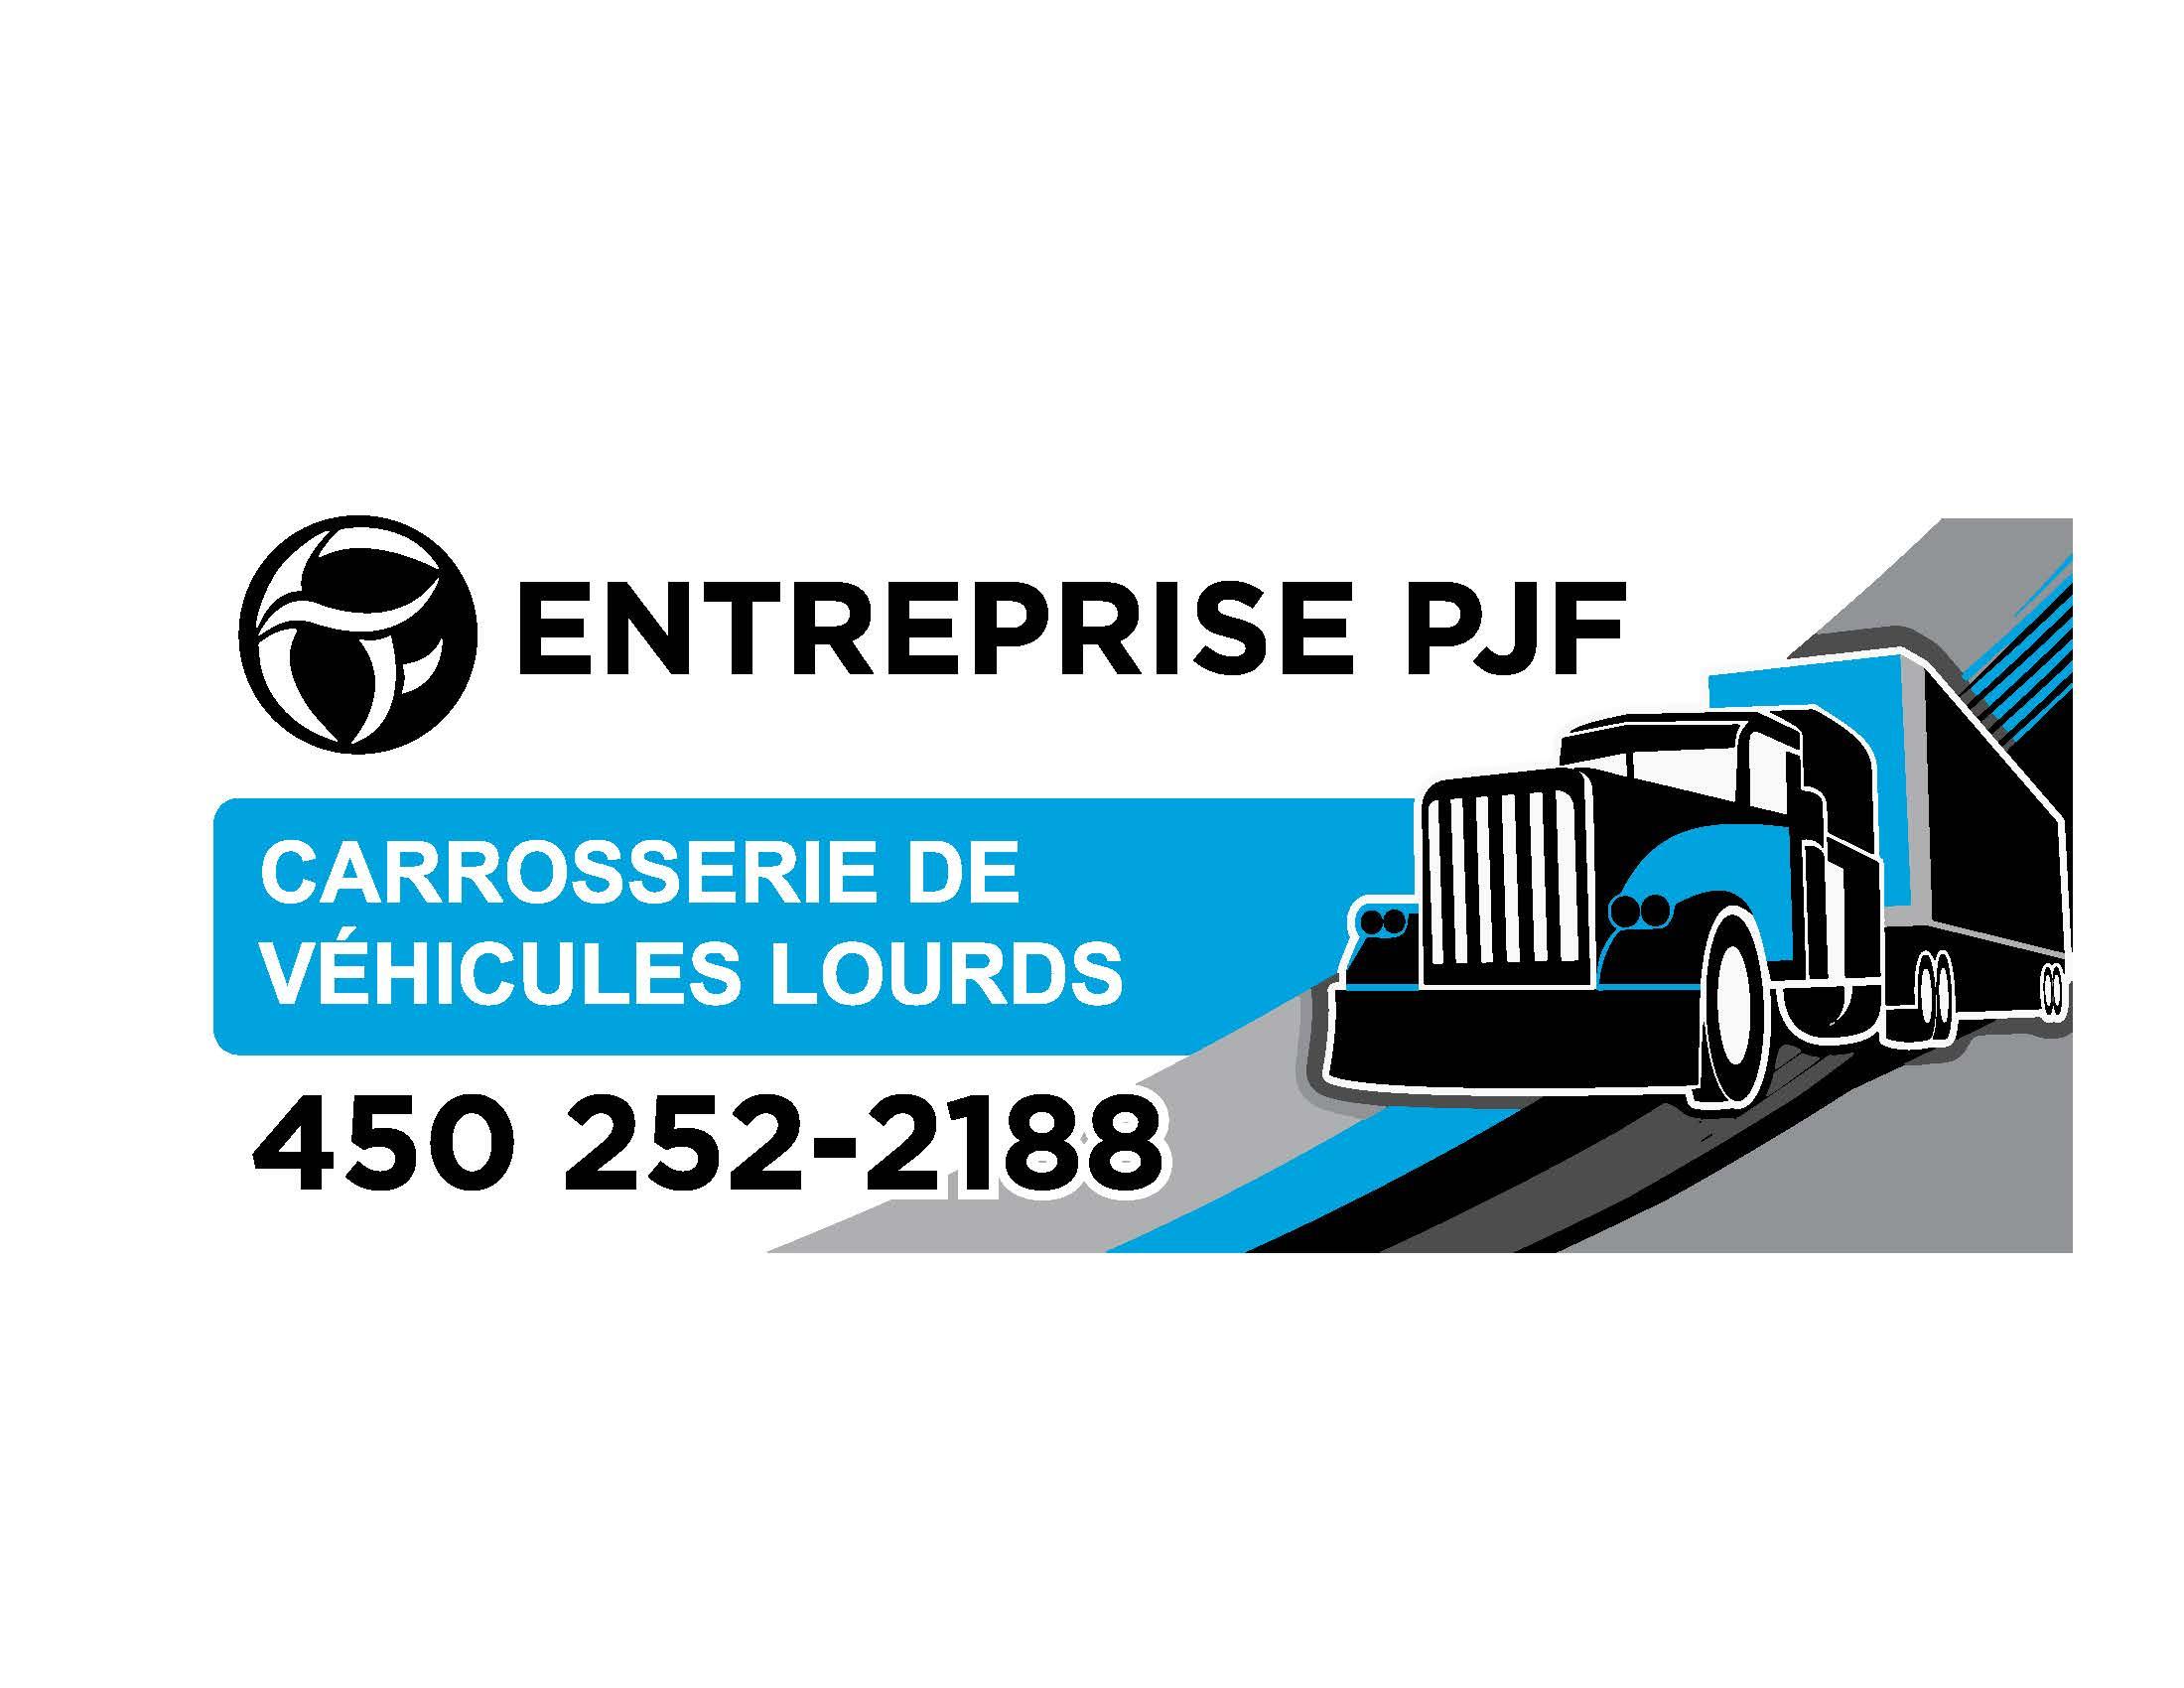 Entreprise PJF